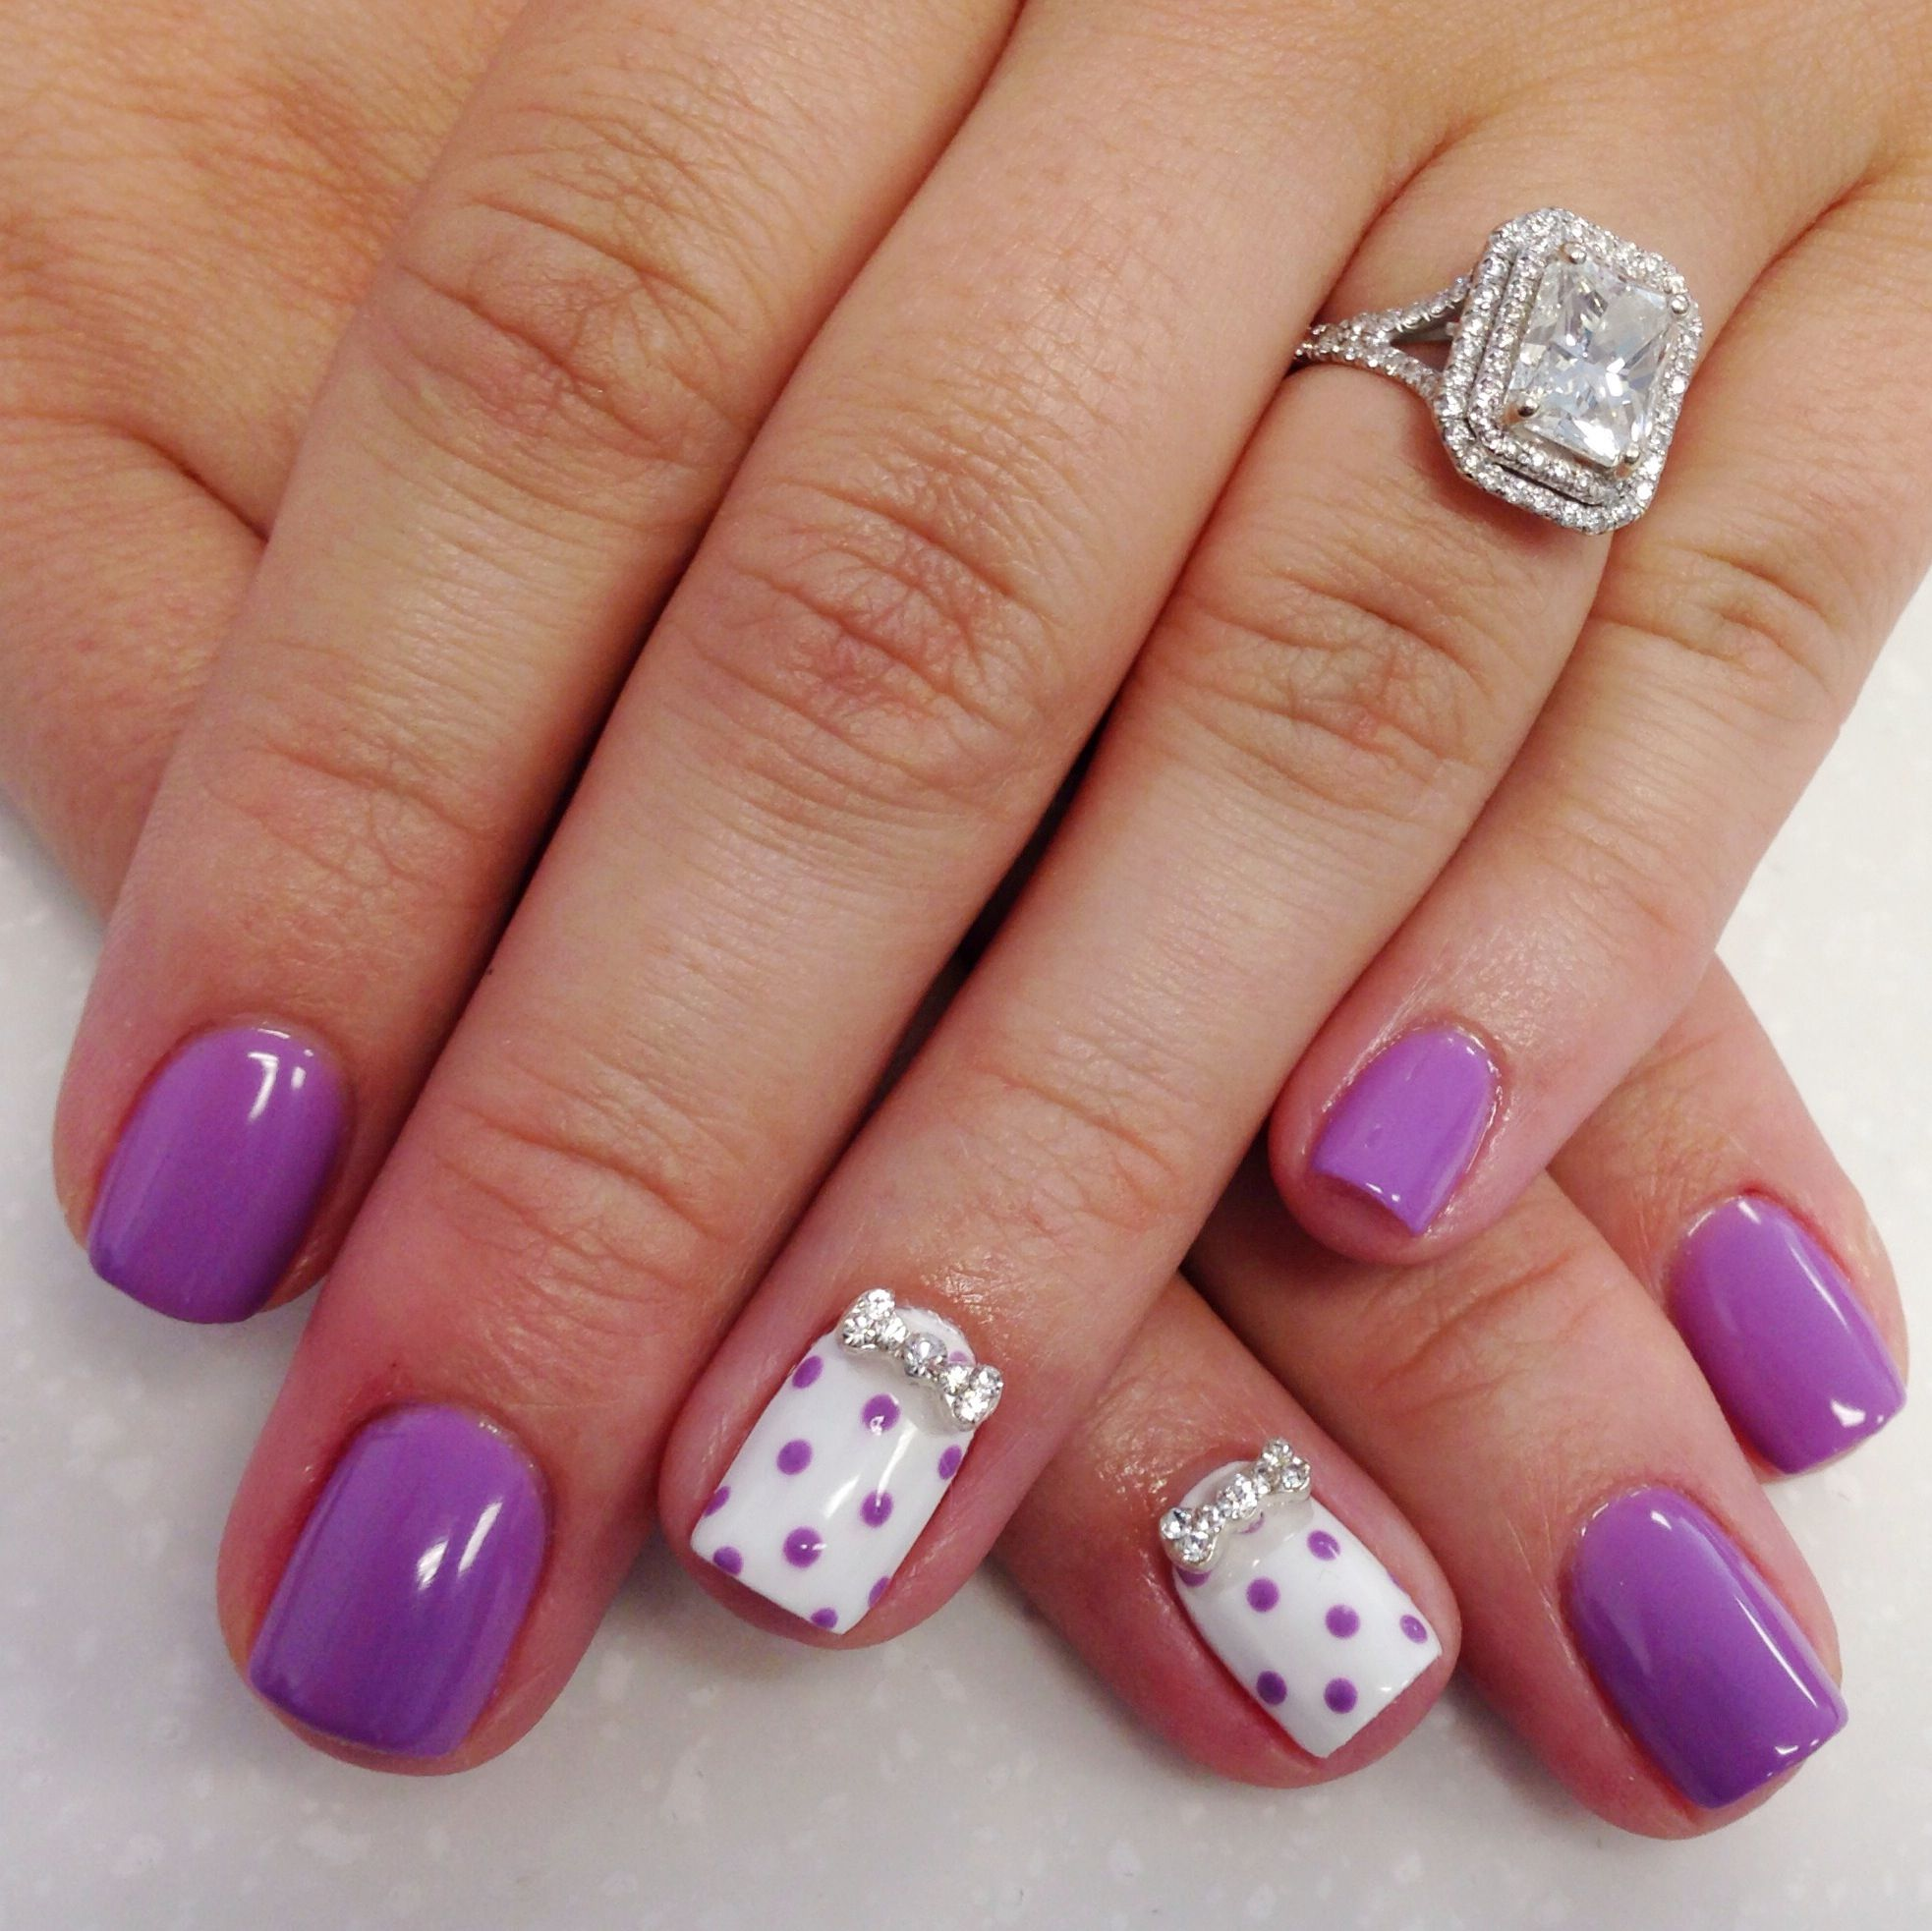 Dots Bow 3d Nail Art Nail Art Pinterest 3d Nail Art Art Nails